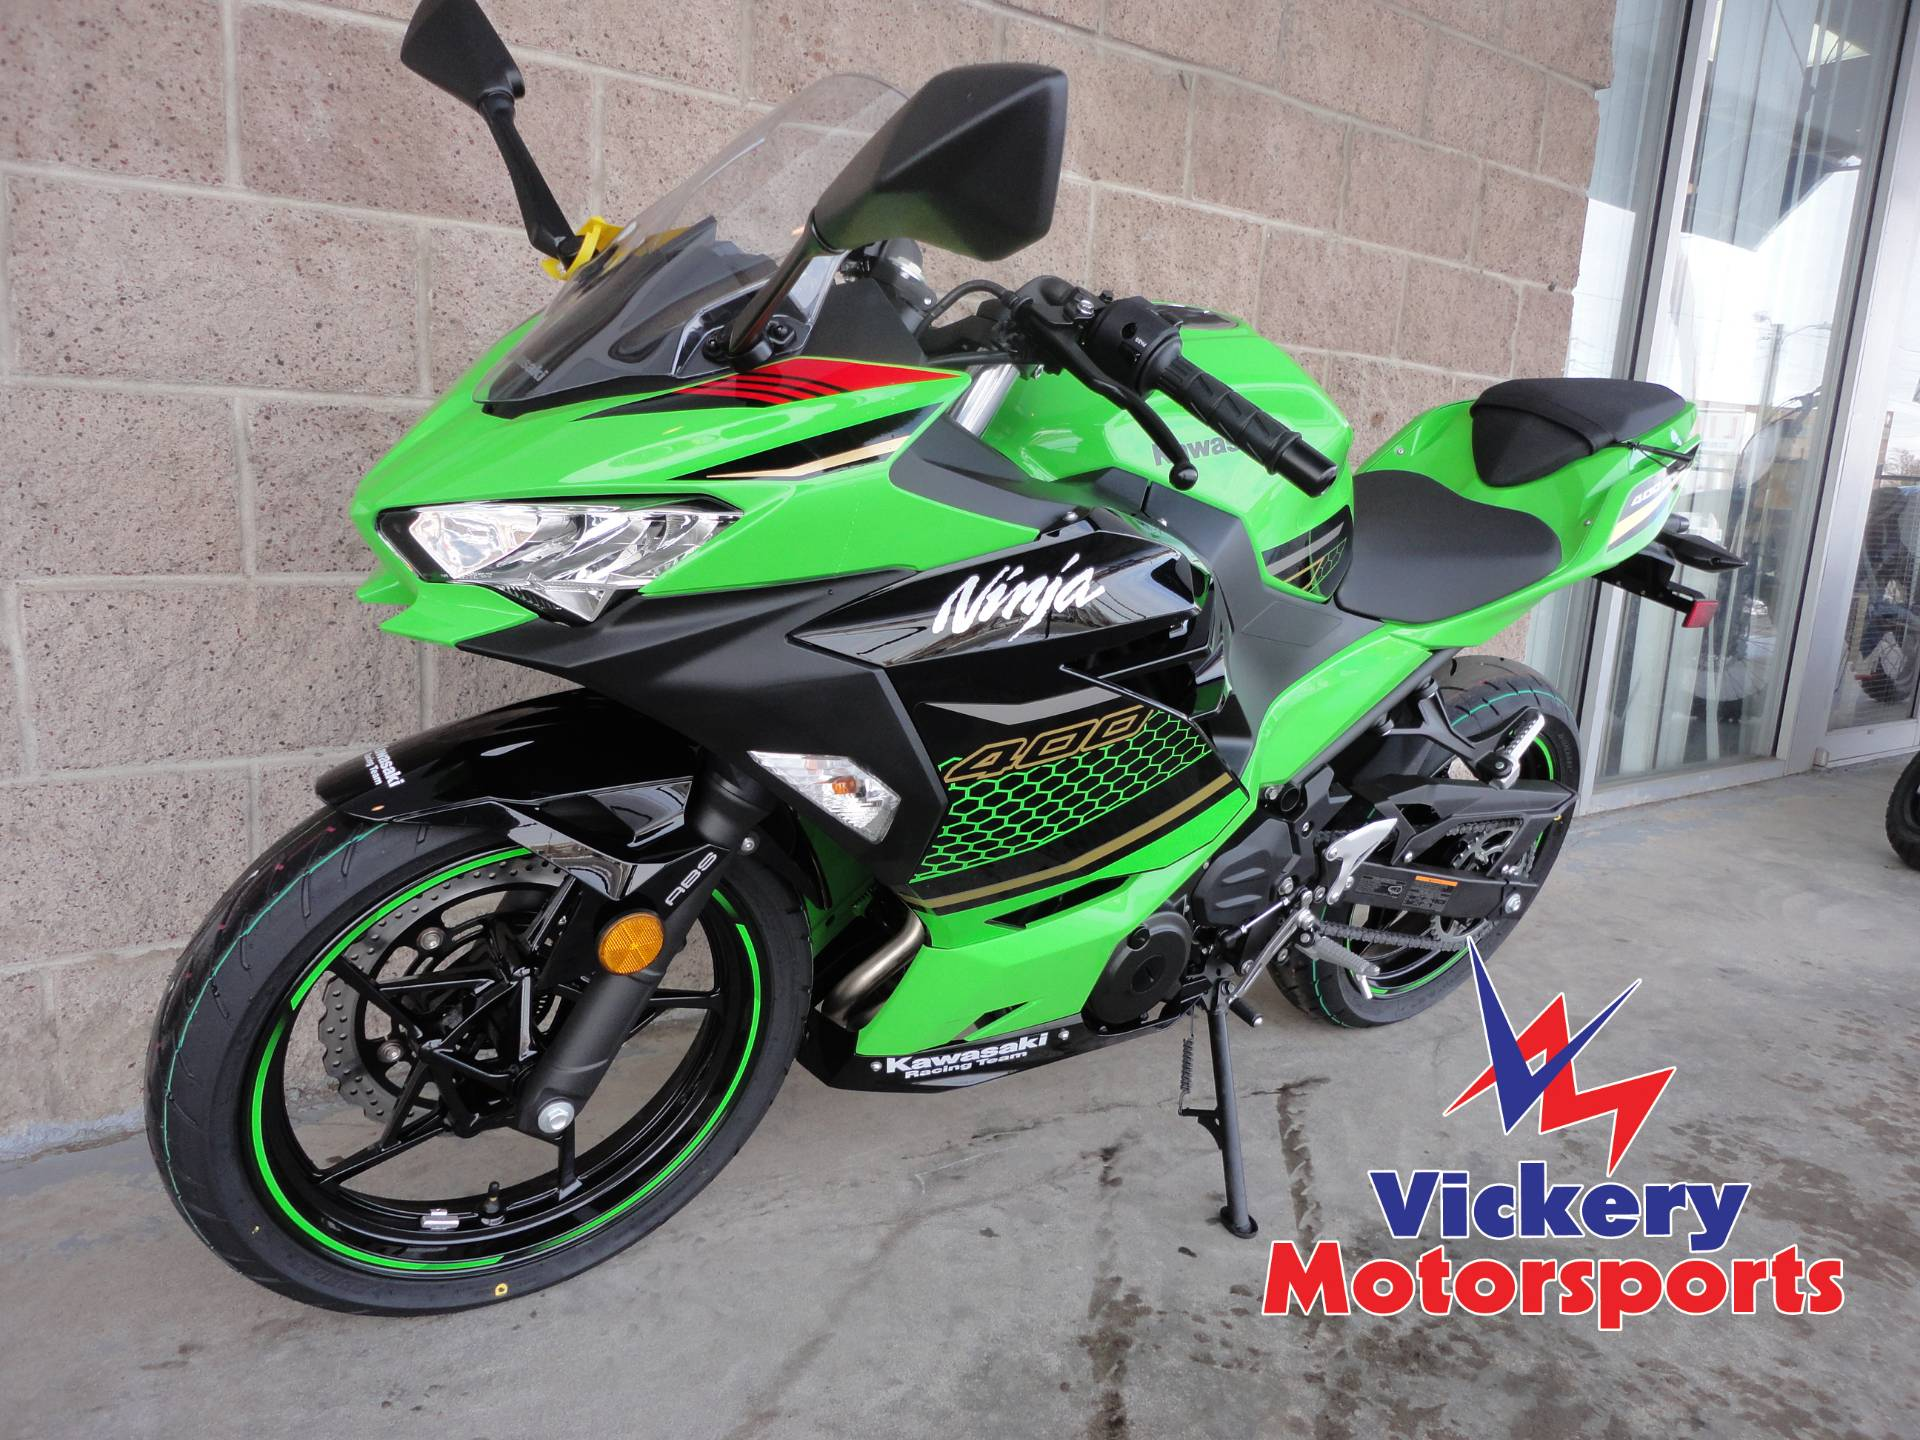 2020 Kawasaki Ninja 400 ABS KRT Edition for sale 232265